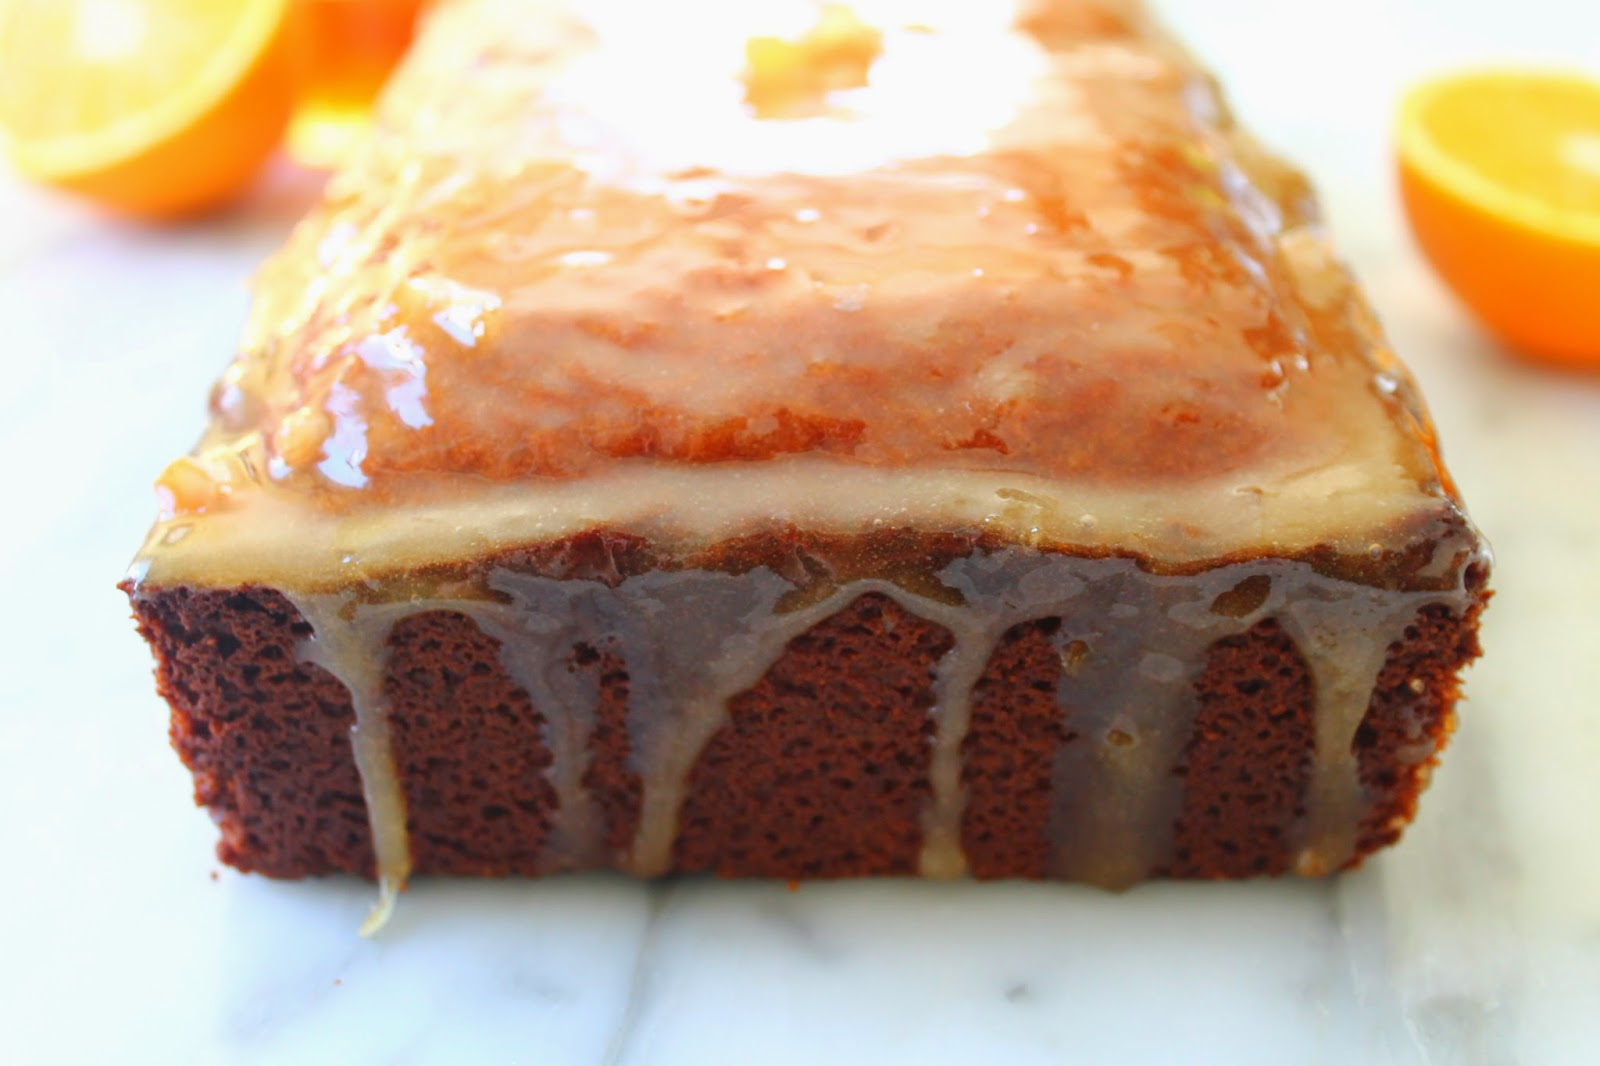 Orange Amp Lemon Marmalade Cake Thank You Weeks 27 Amp 28